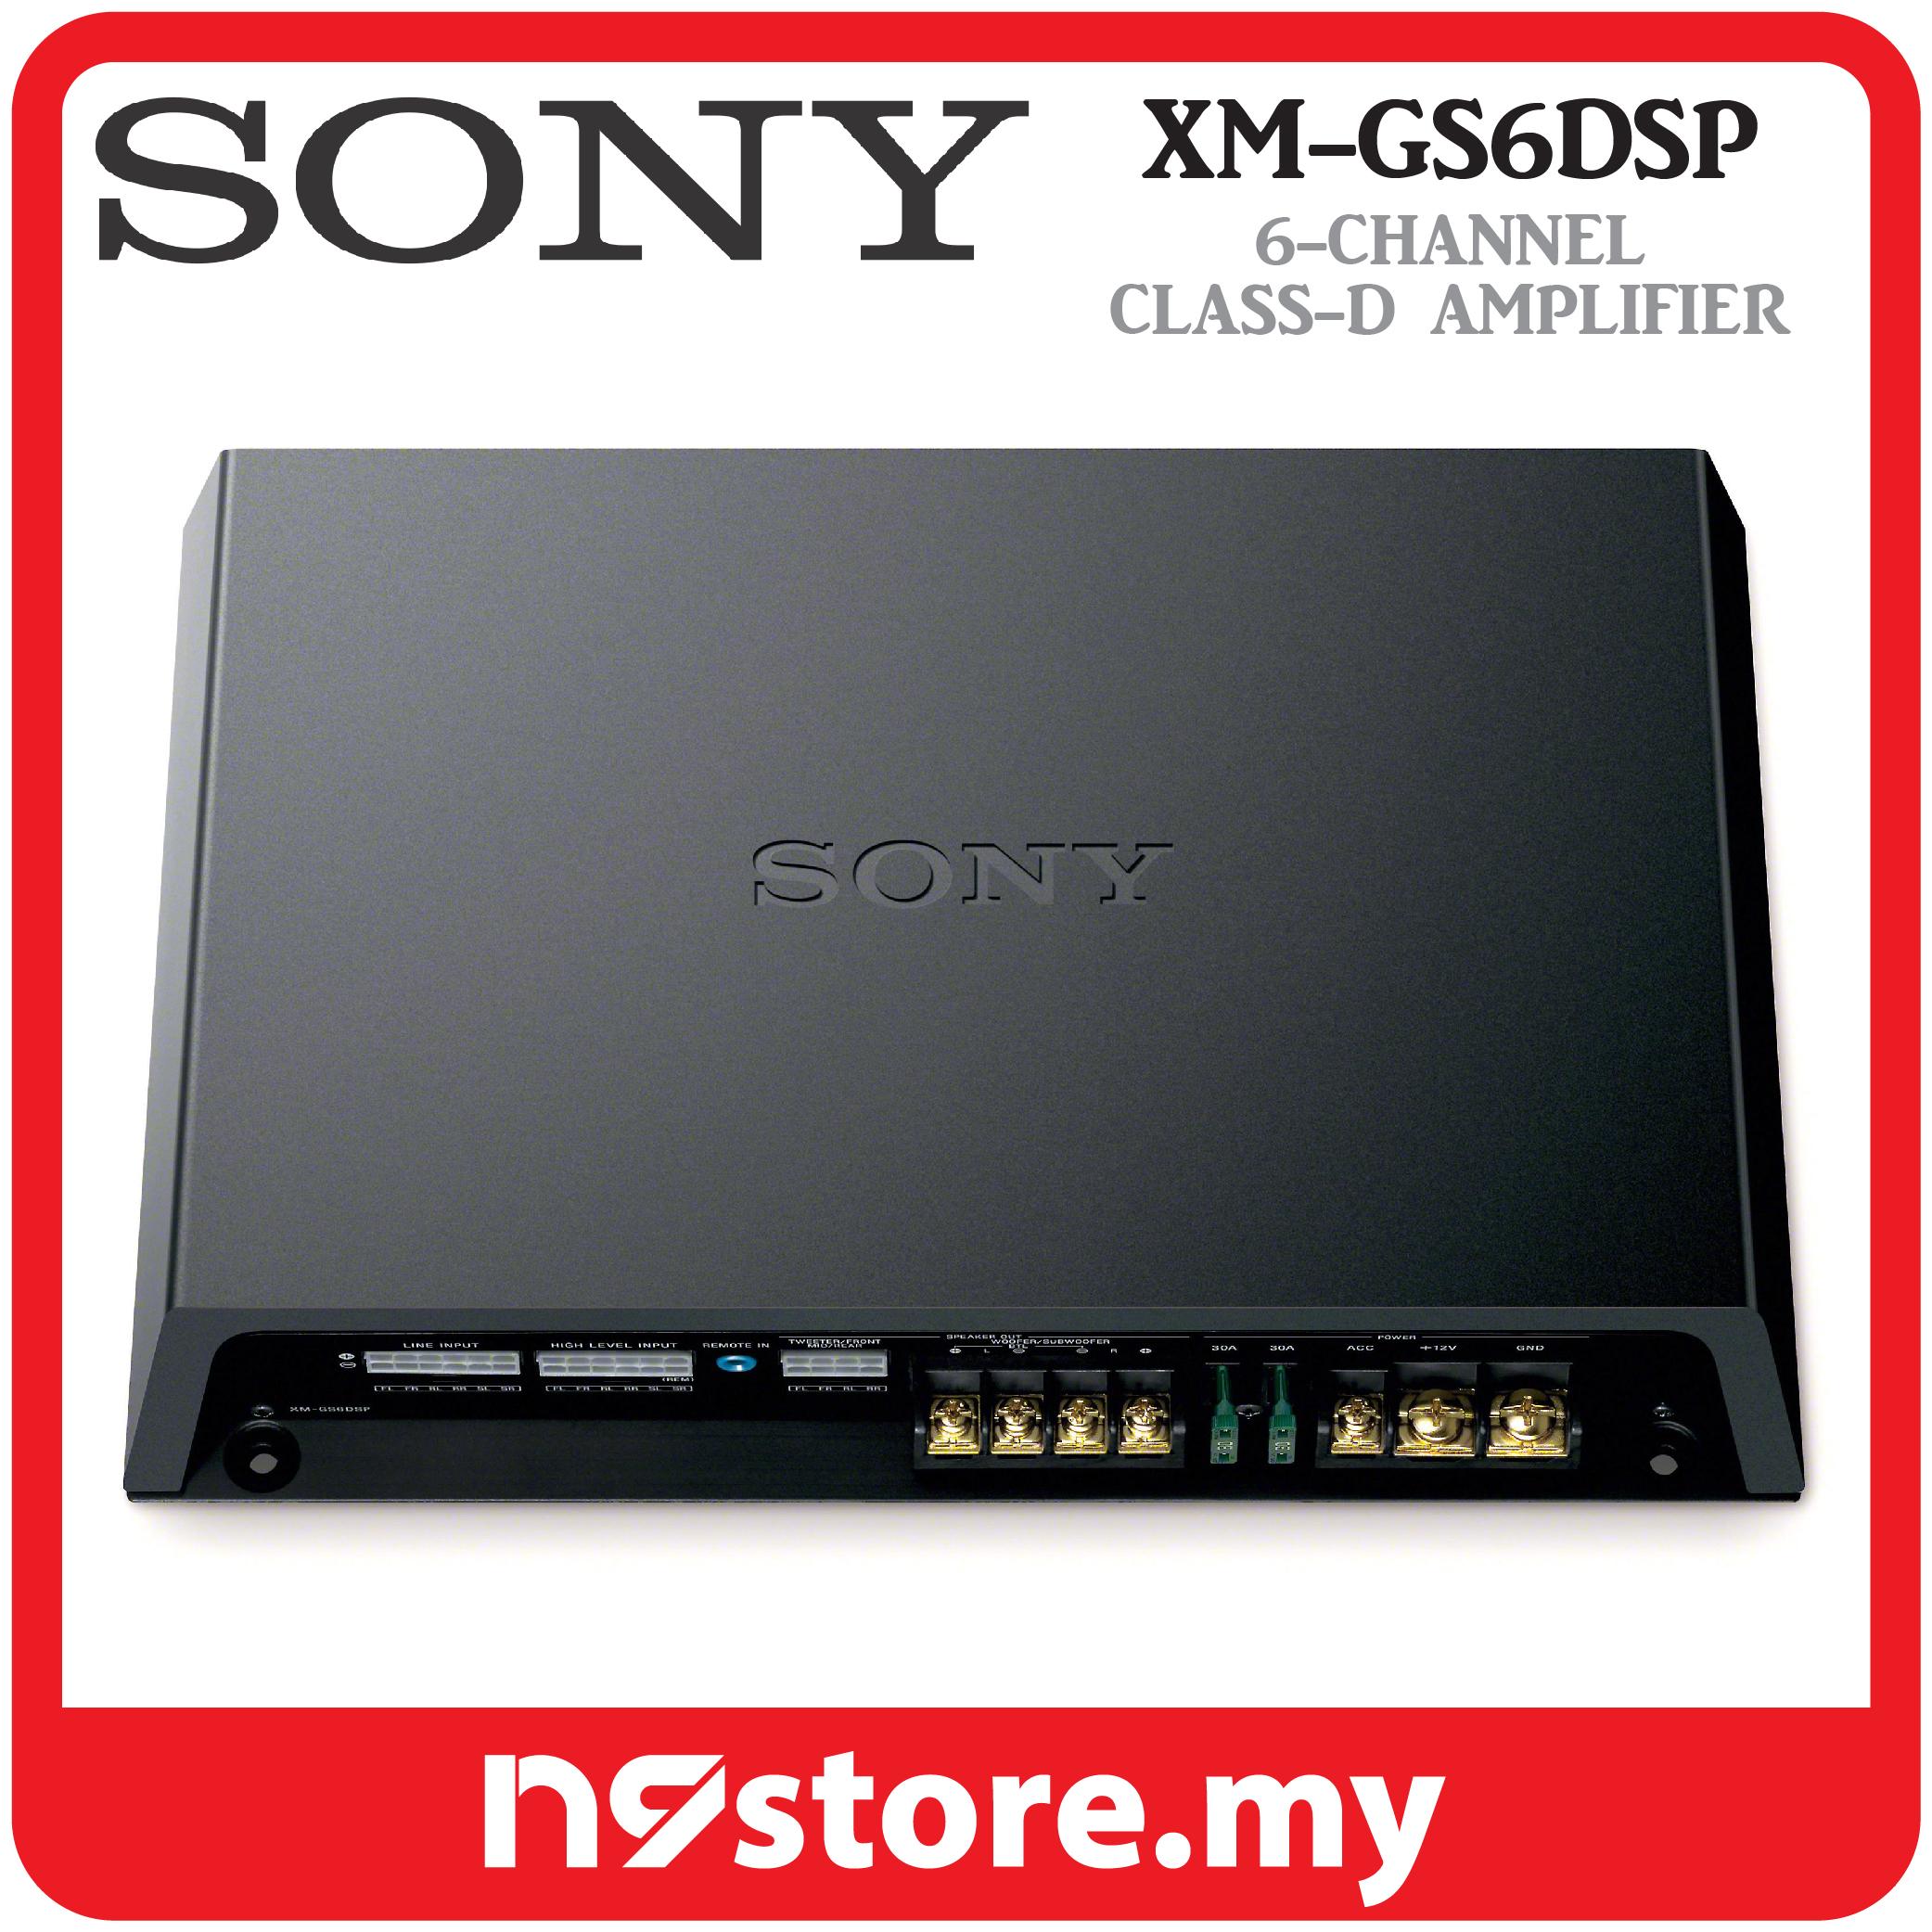 Sony XM-GS6DSP 6/5 Channel Class-D Amplifier With DSP 45W X 4 90W X 2